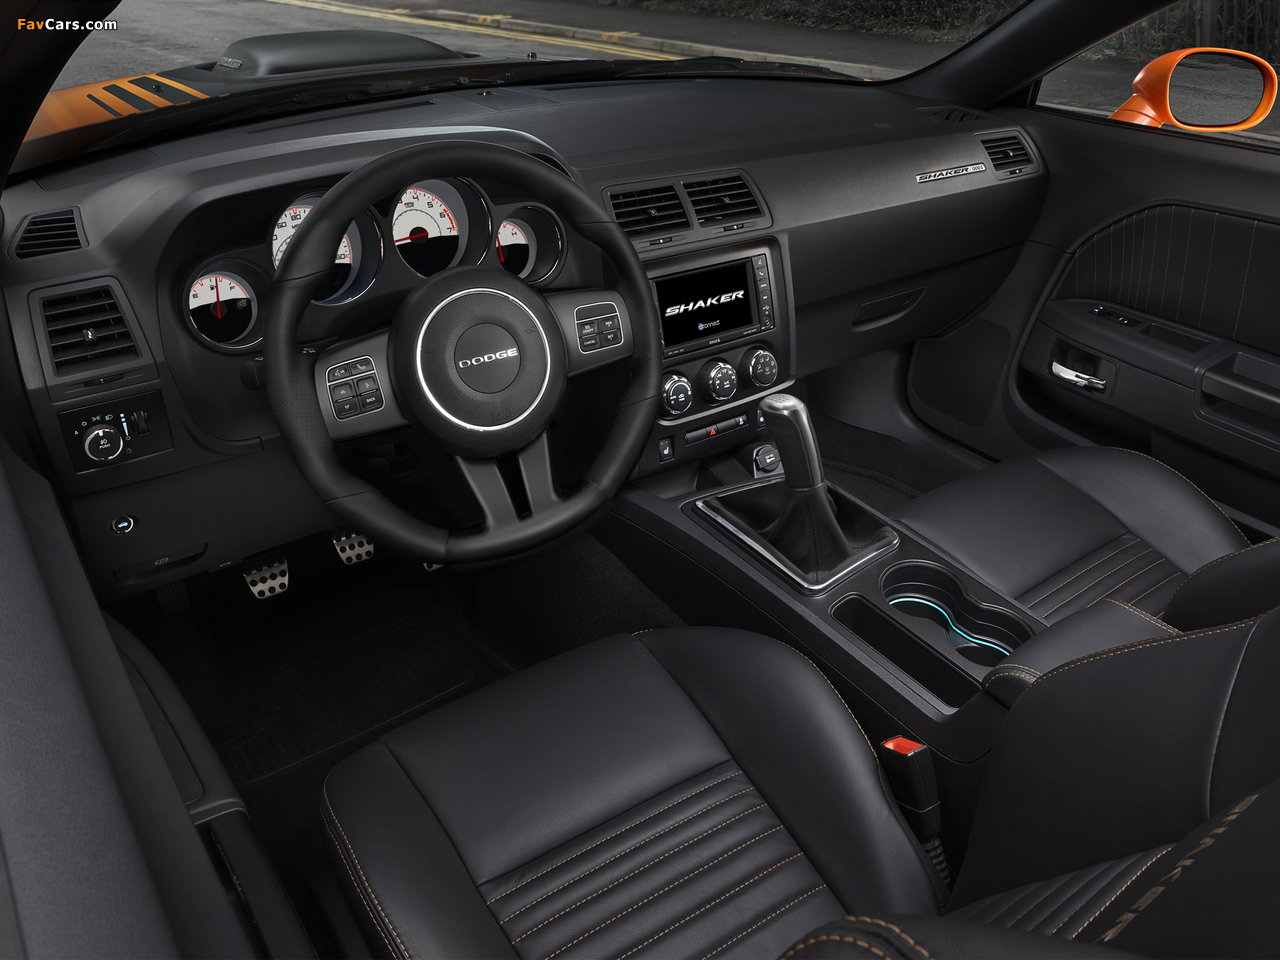 Dodge Challenger R/T Shaker 2014 photos (1280 x 960)